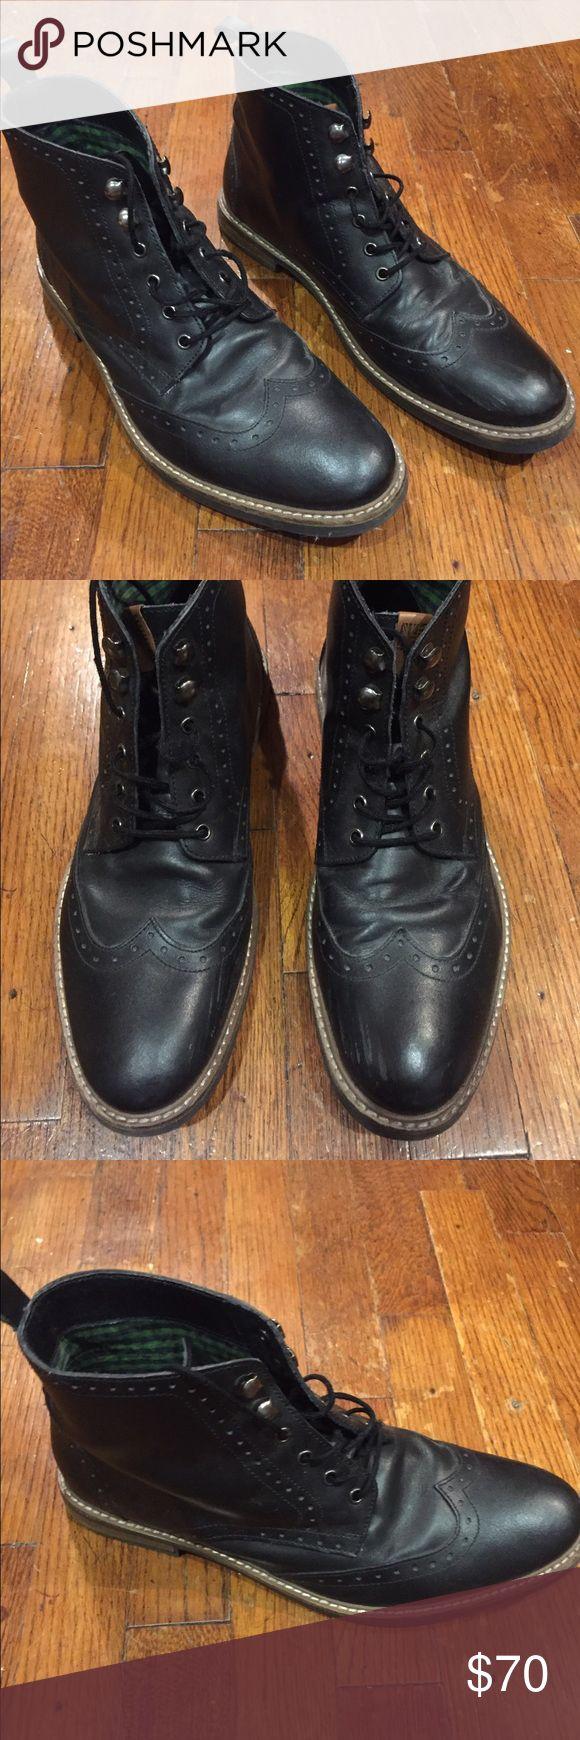 Birk Wingtip Boot Ben Sherman black men's boots. Minimal visible scuffing. Ben Sherman Shoes Boots